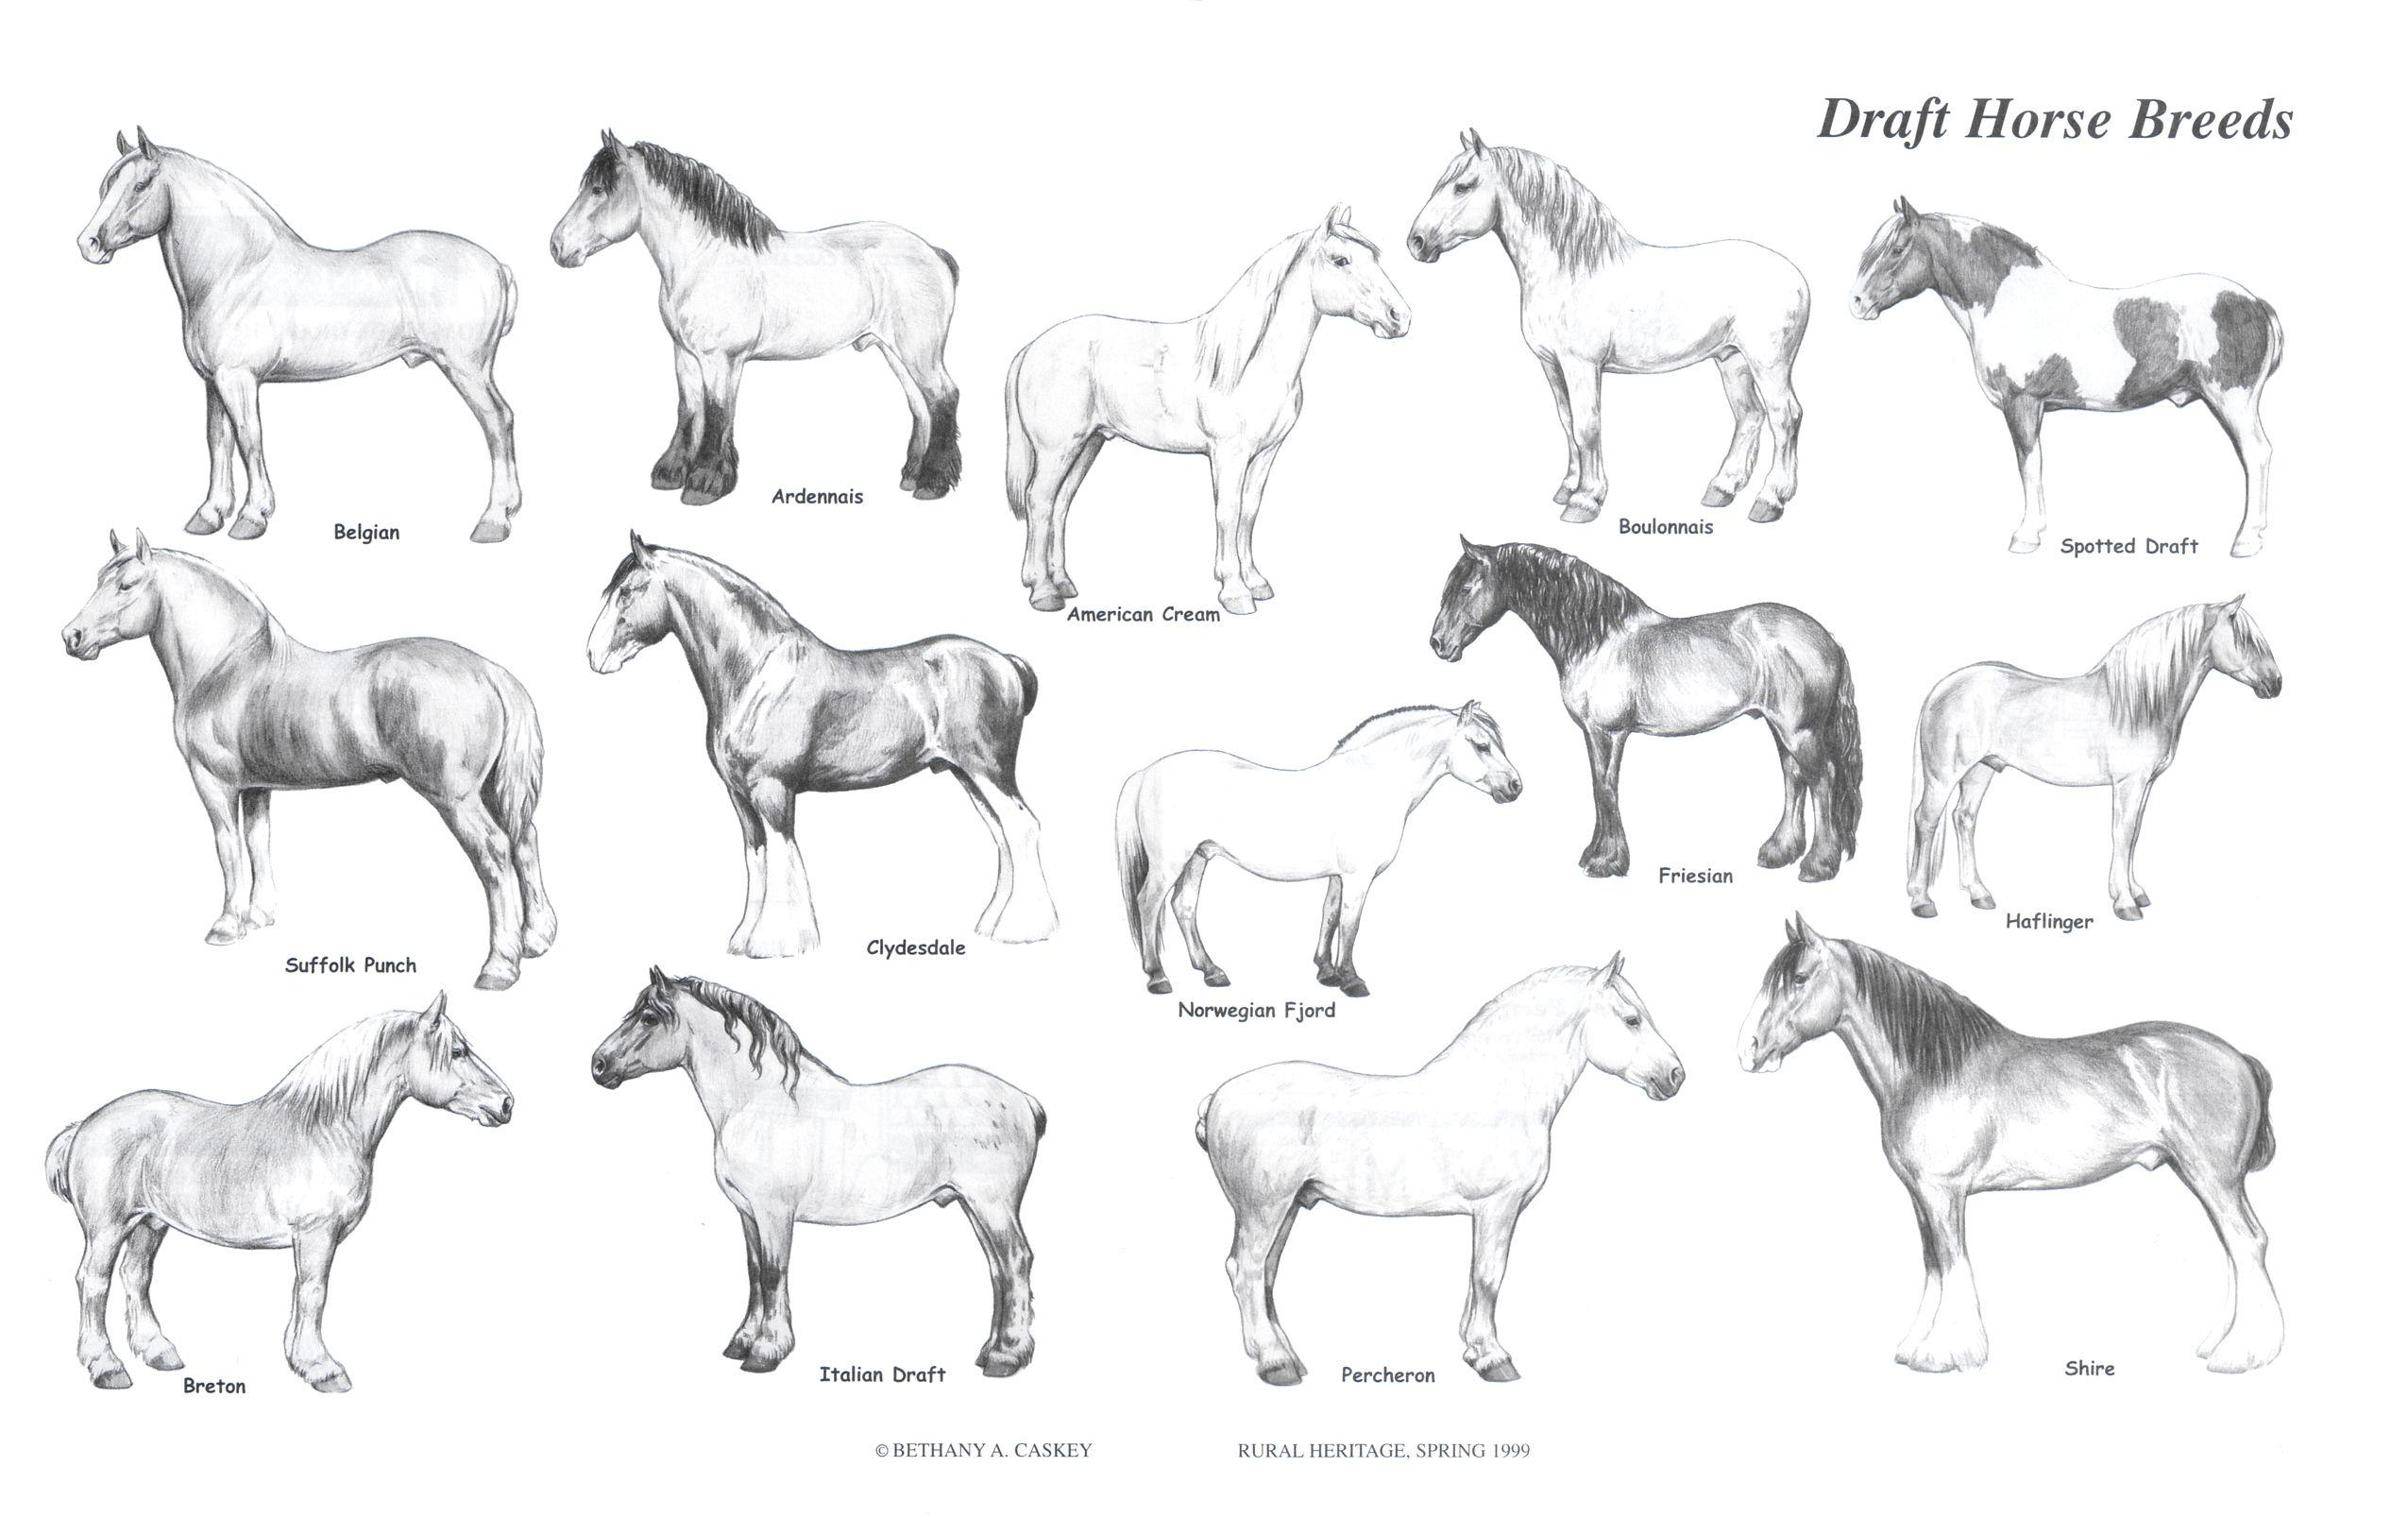 Parts Of A Horse Draft Horse Breeds Draft Horses Horse Breeds [ 1624 x 2550 Pixel ]